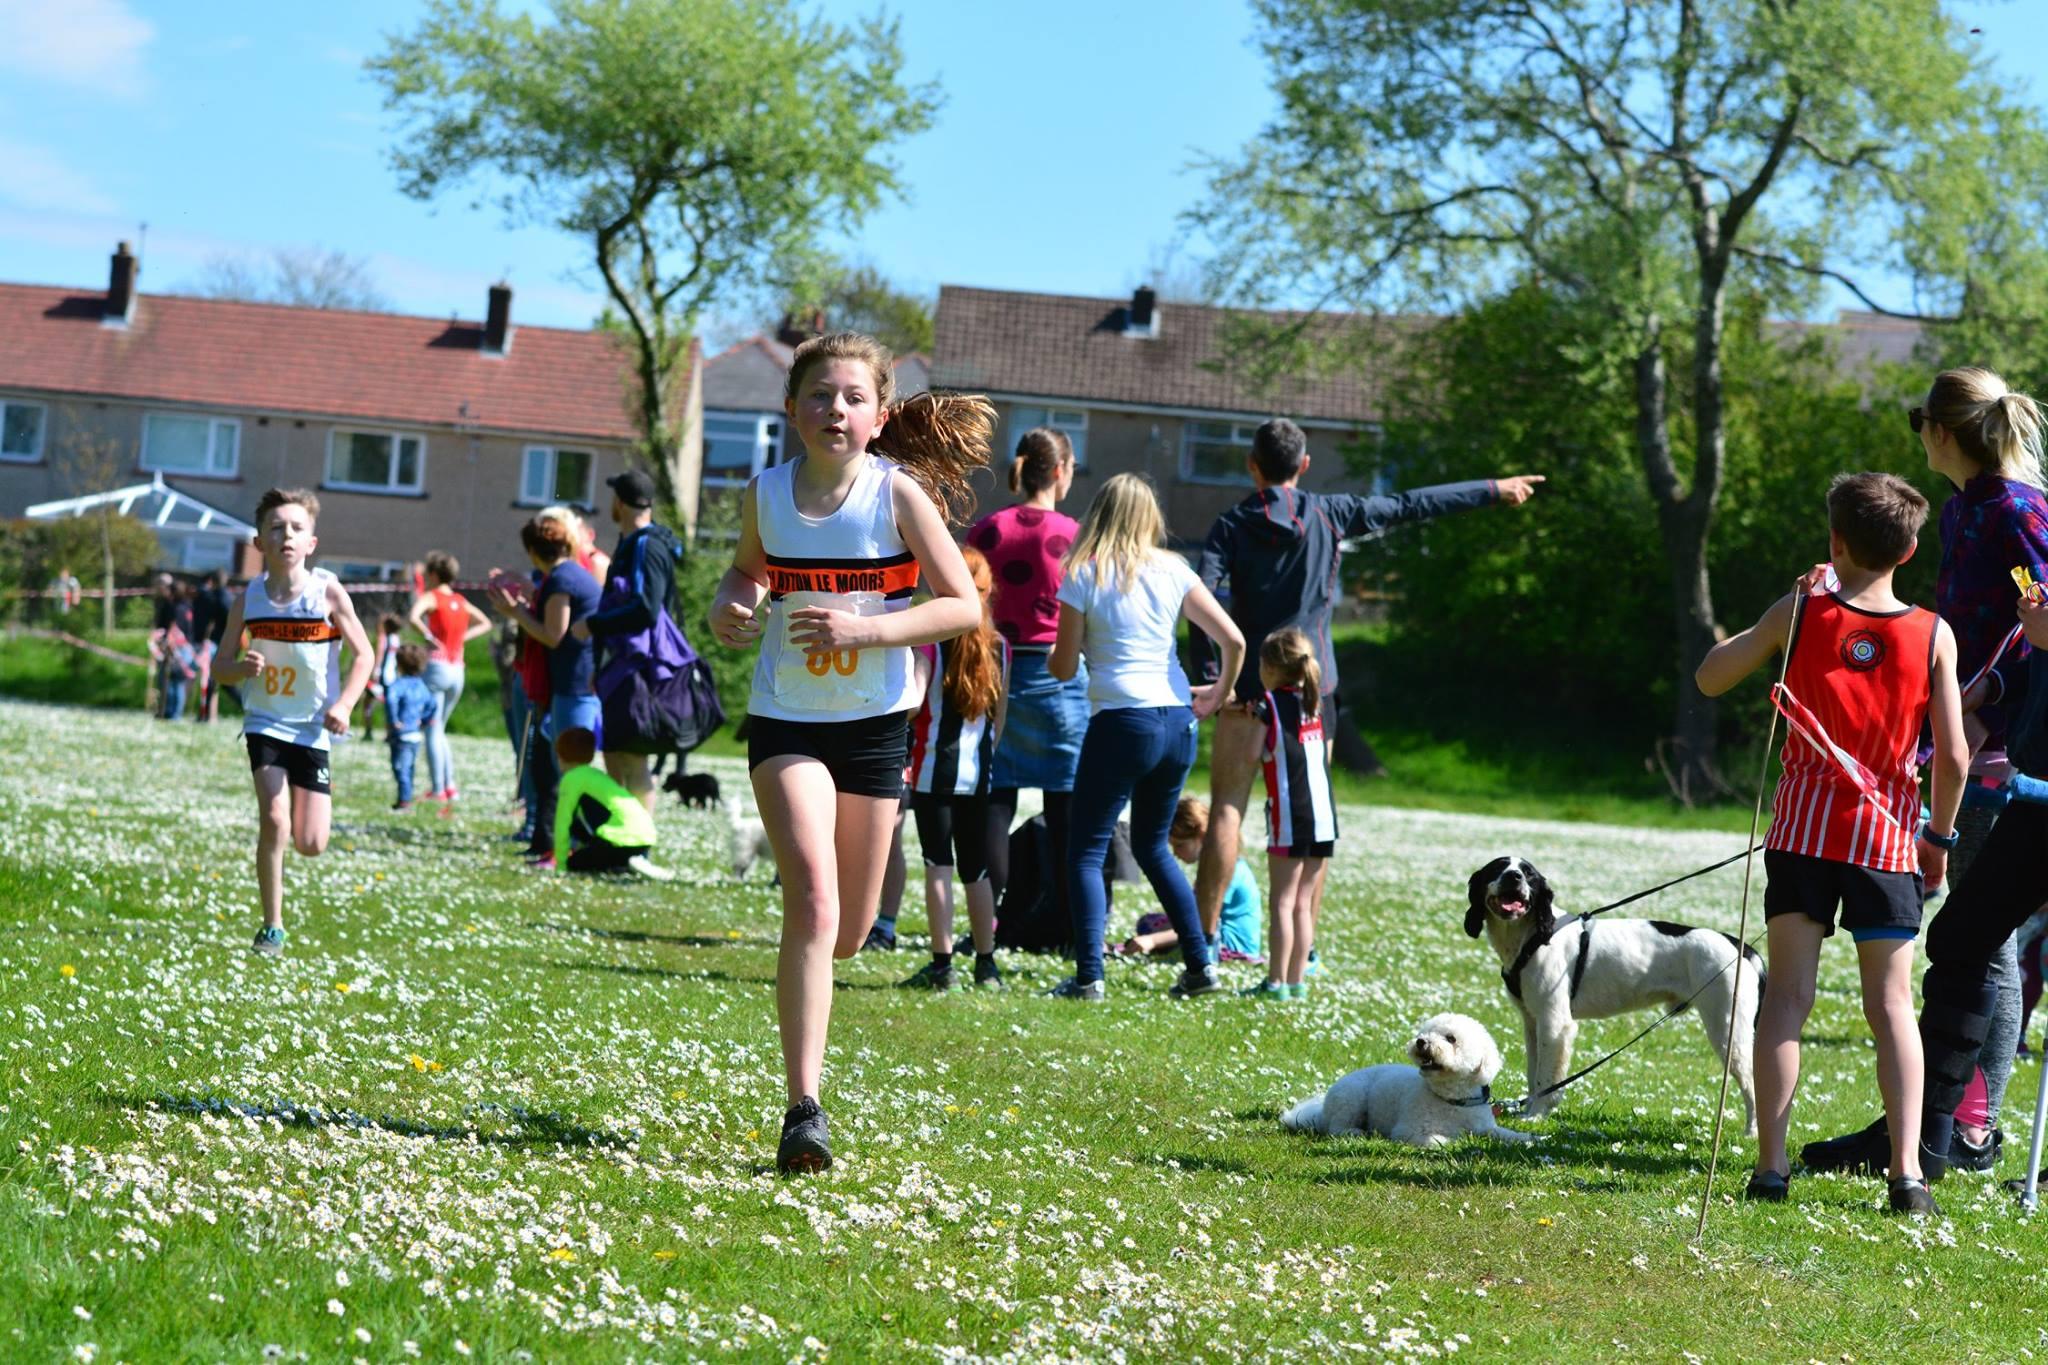 Imogen Ferguson powering to the finish. Photo by David Belshaw